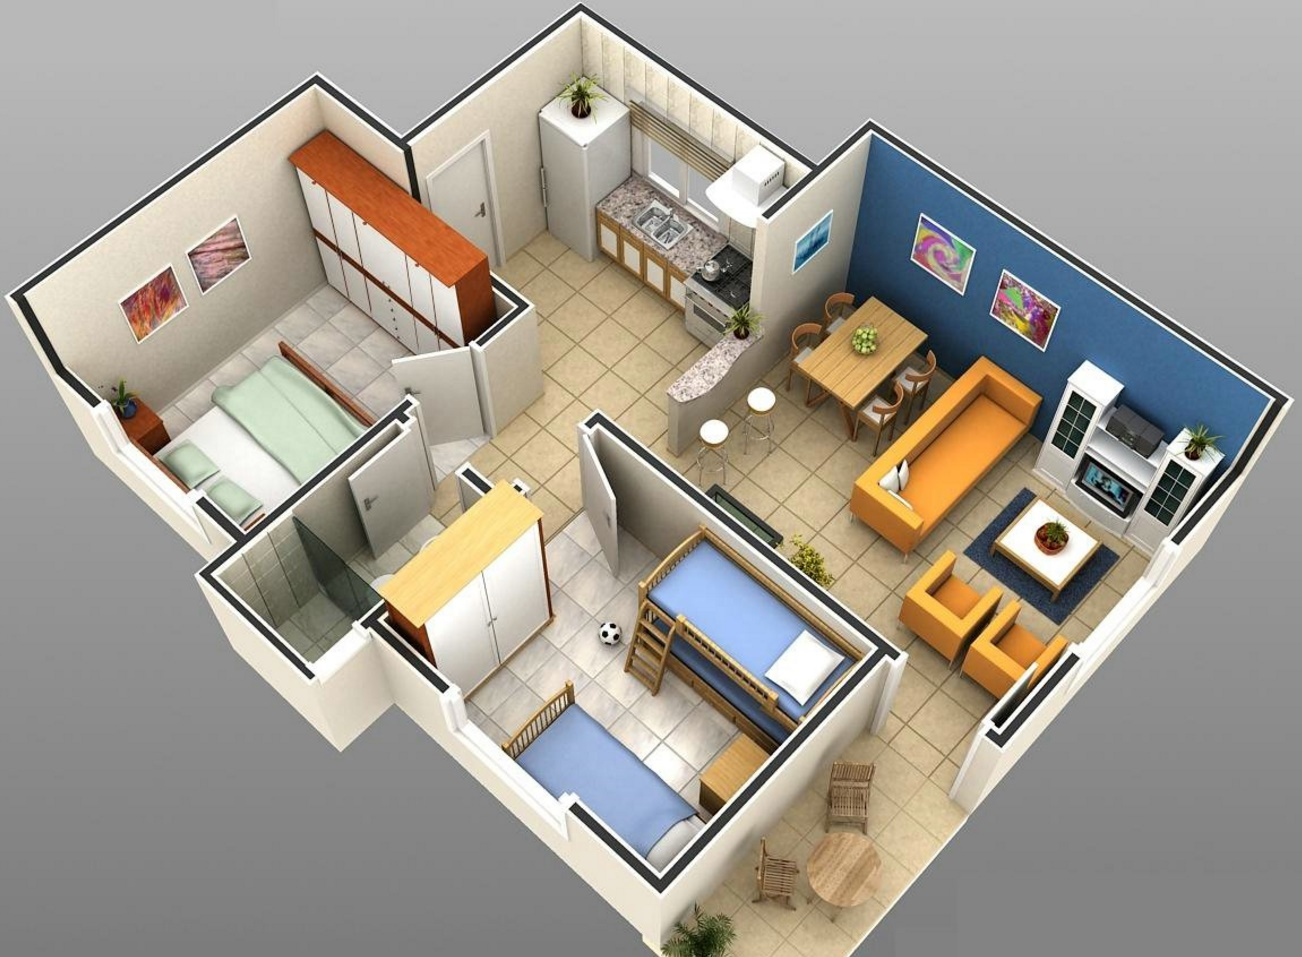 Planos de casa modernas Planos interiores de casas modernas